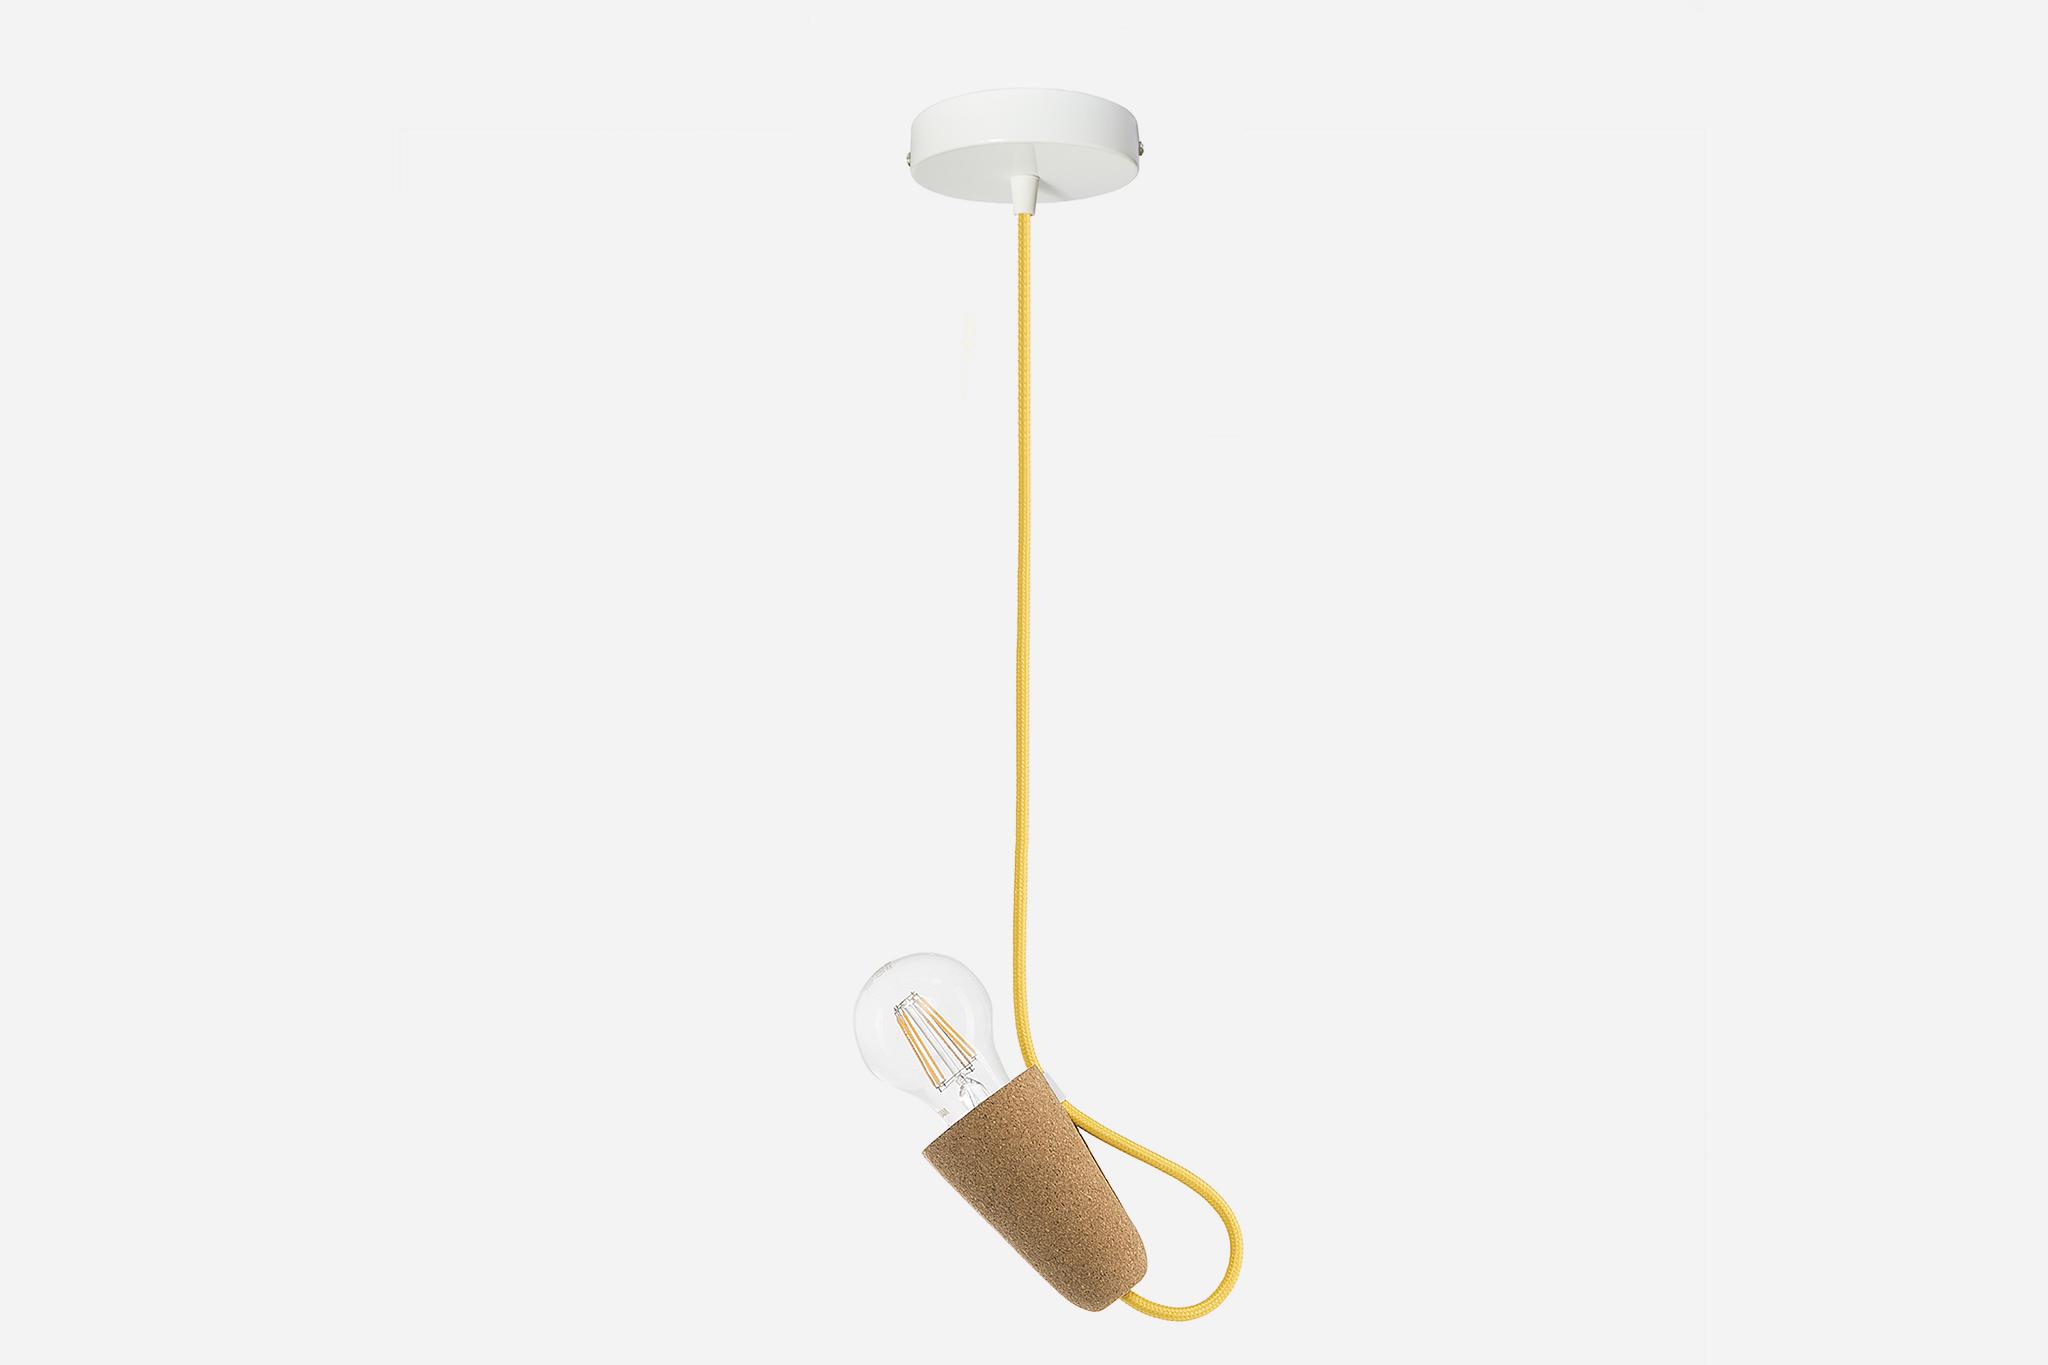 Galula | Sininho pendant lamp, light cork and yellow textile cable